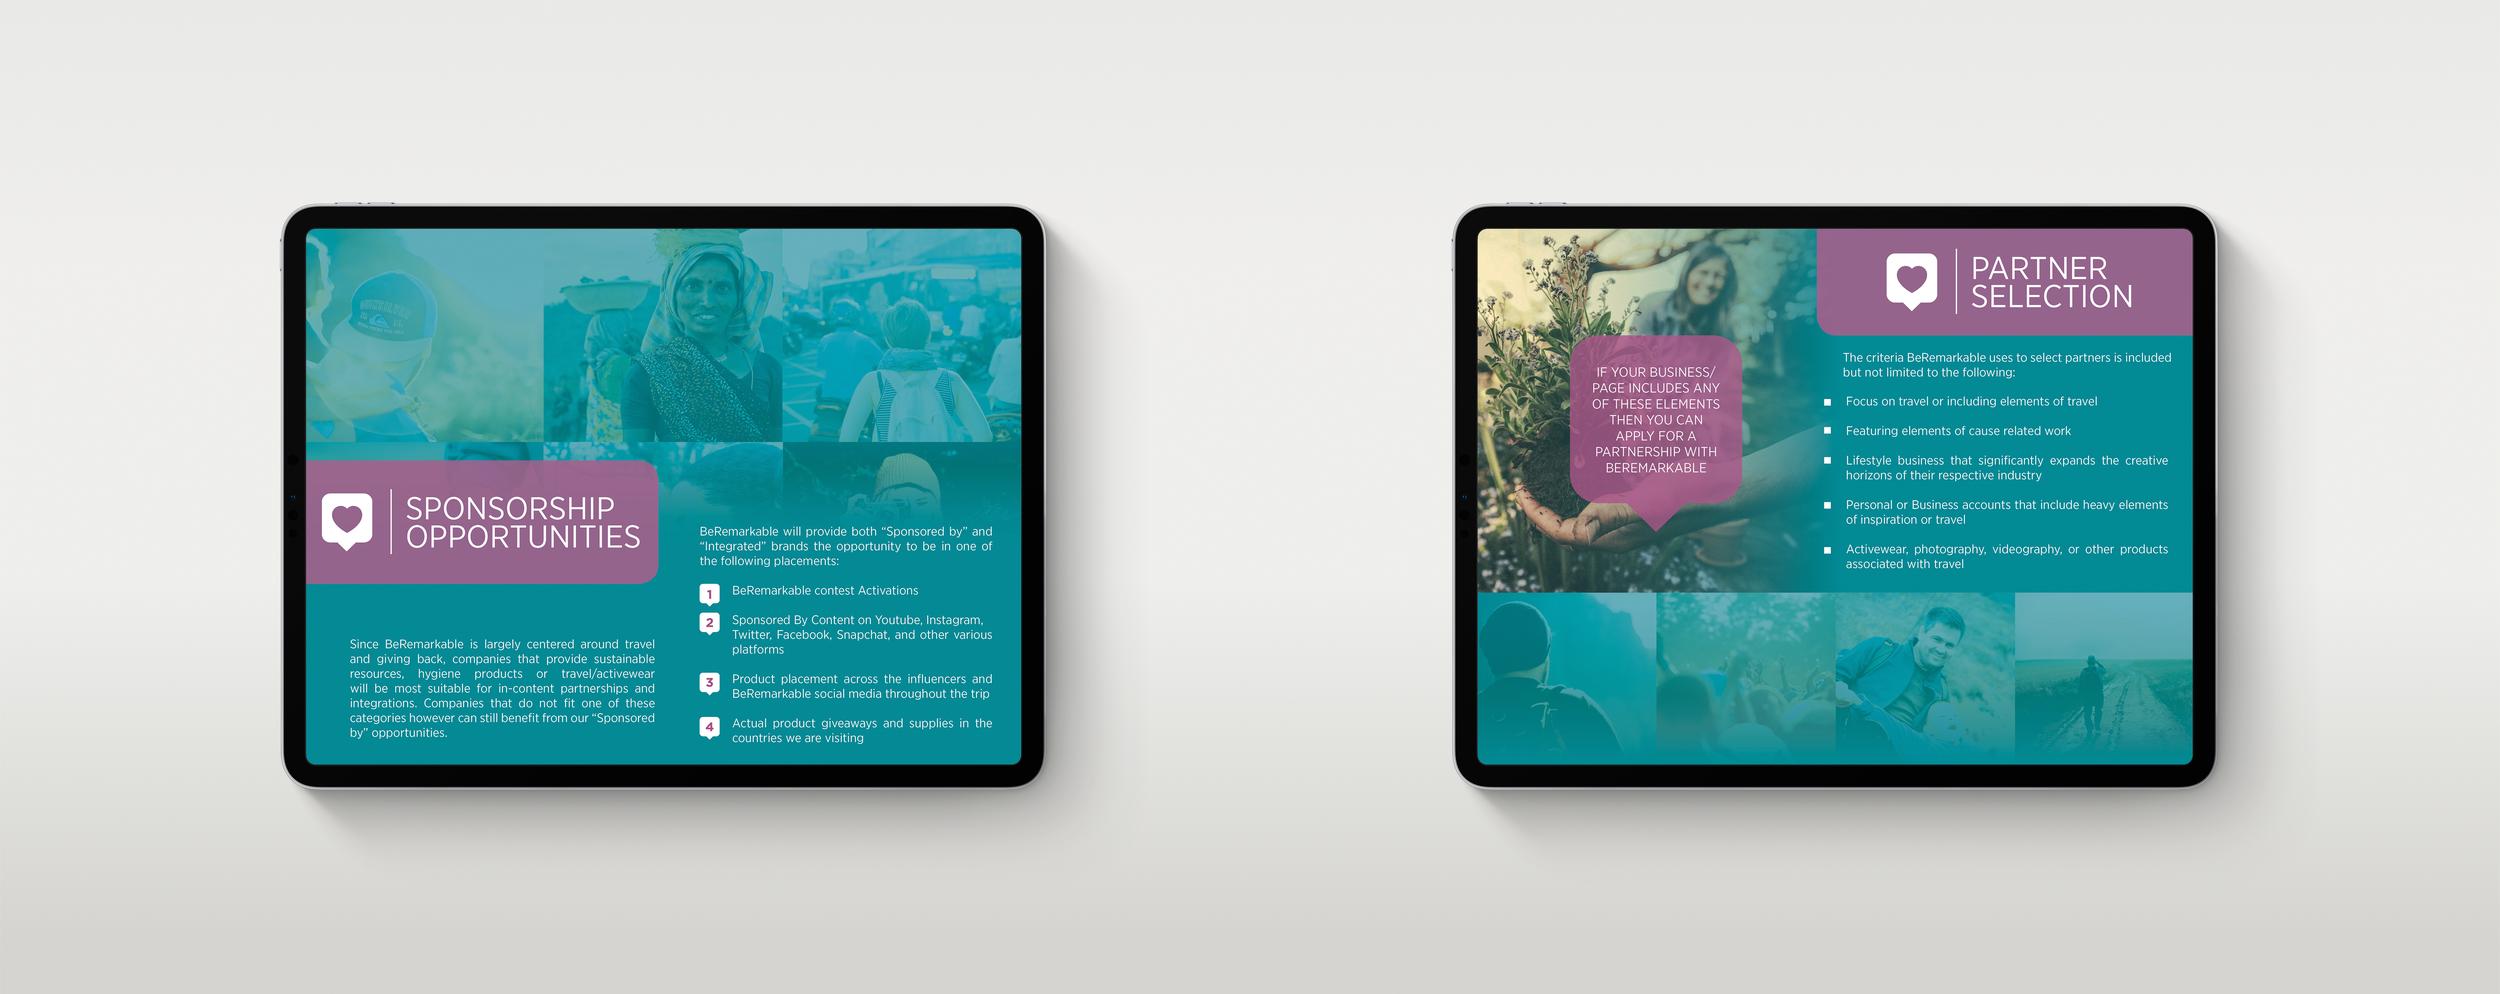 BeRemarkable_iPad-Pro-Mockup-2.png